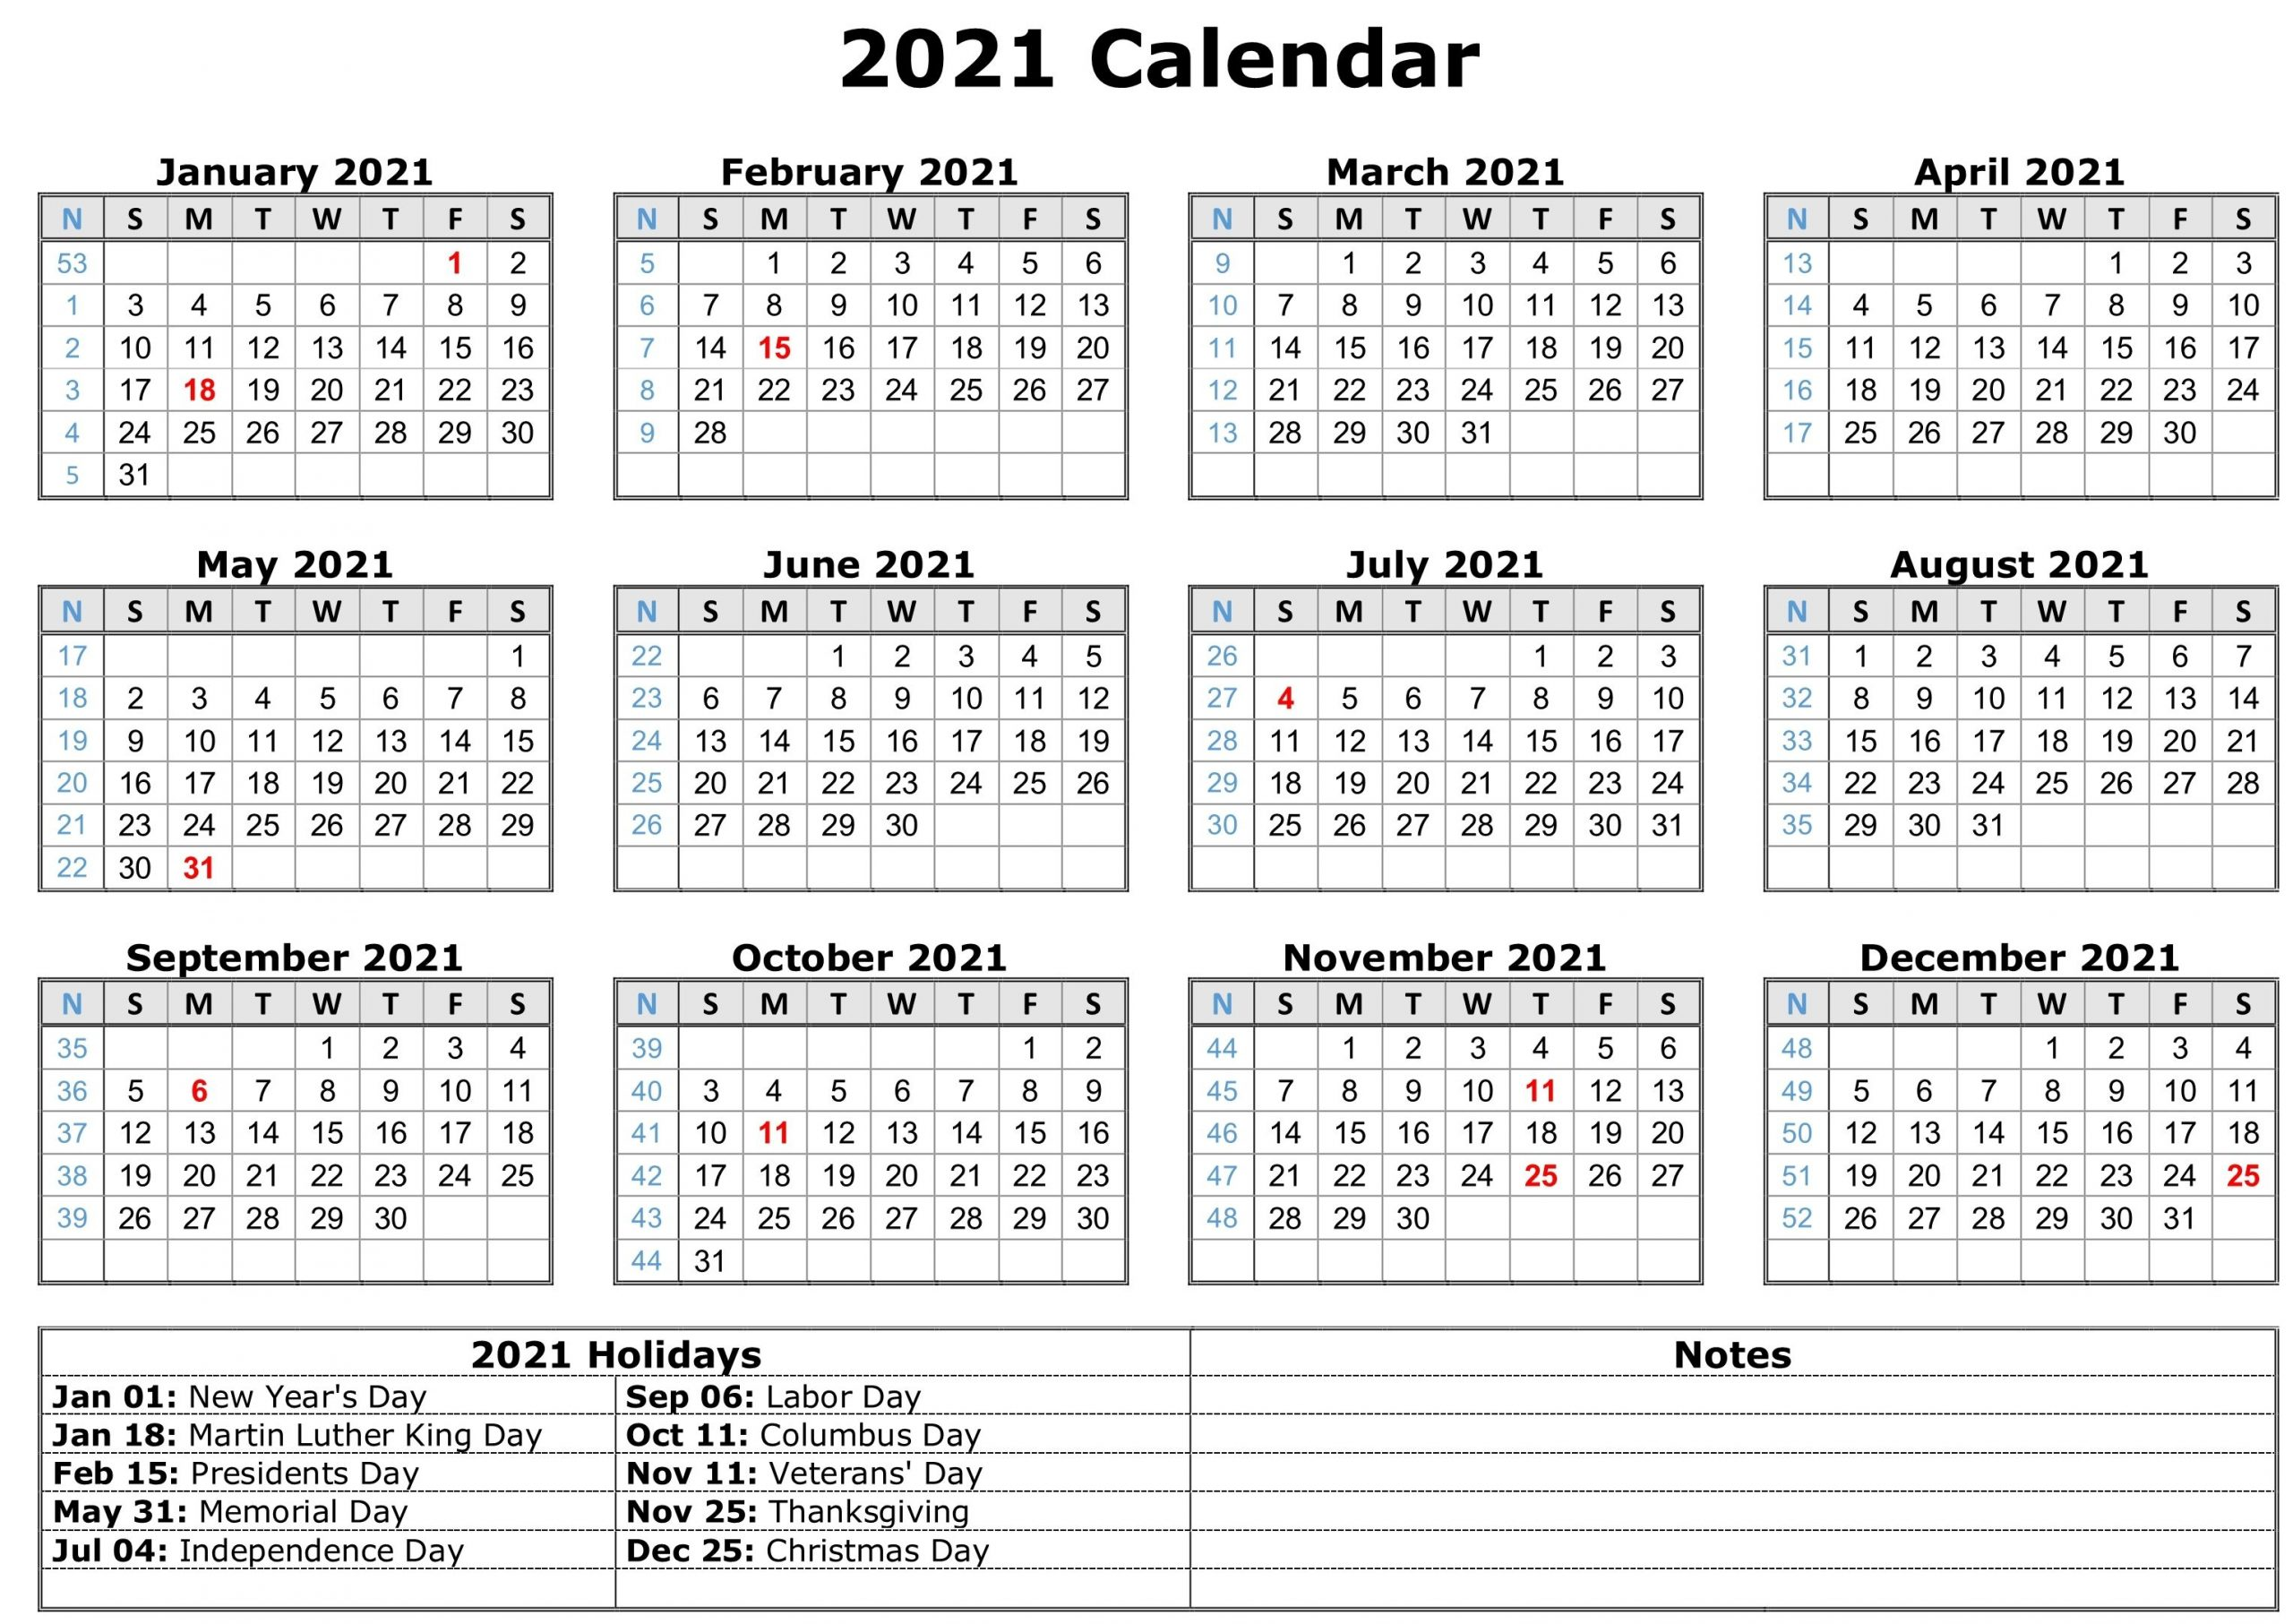 School Schedule For Springs Charter School This Week in Lake Orion High School Calendar 2020